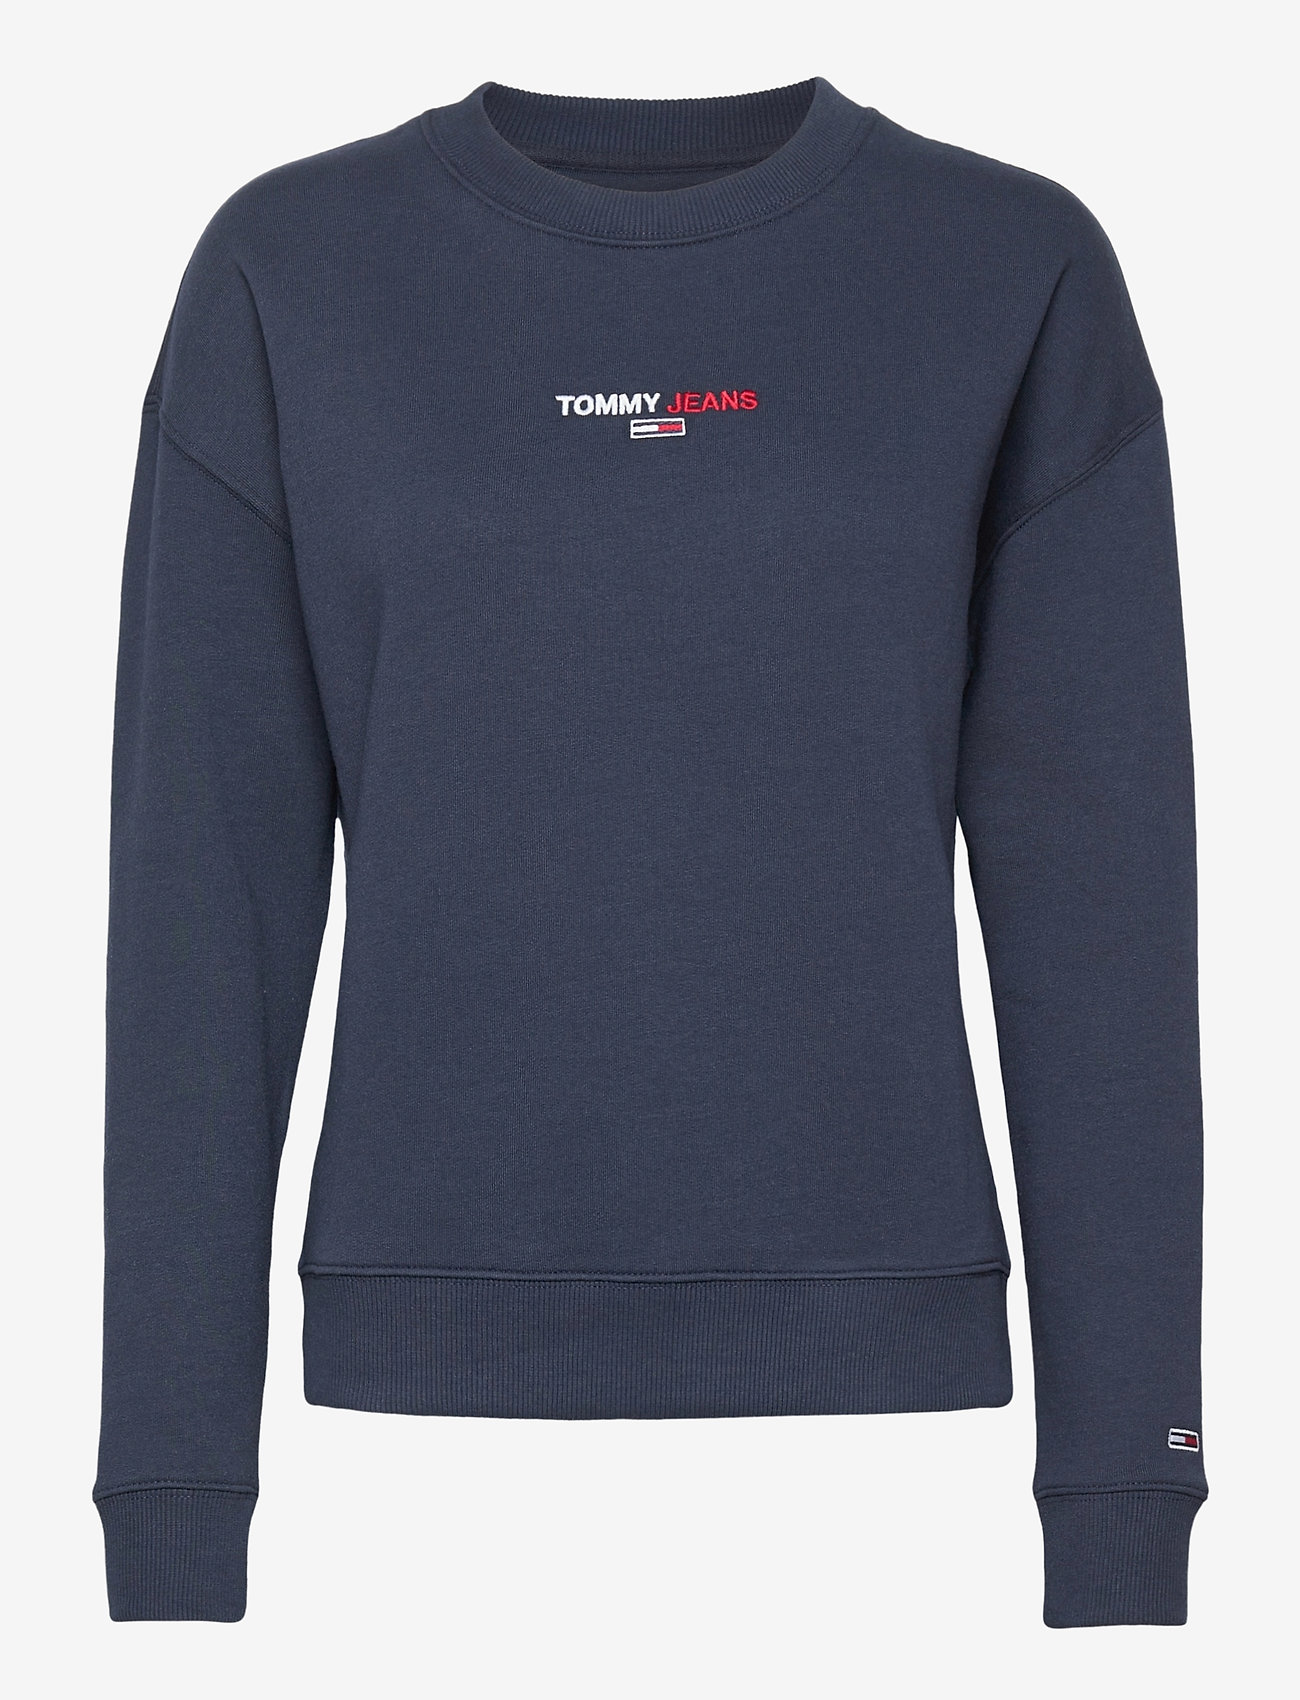 Tommy Jeans - TJW LINEAR CREW NECK - sweatshirts - twilight navy - 0